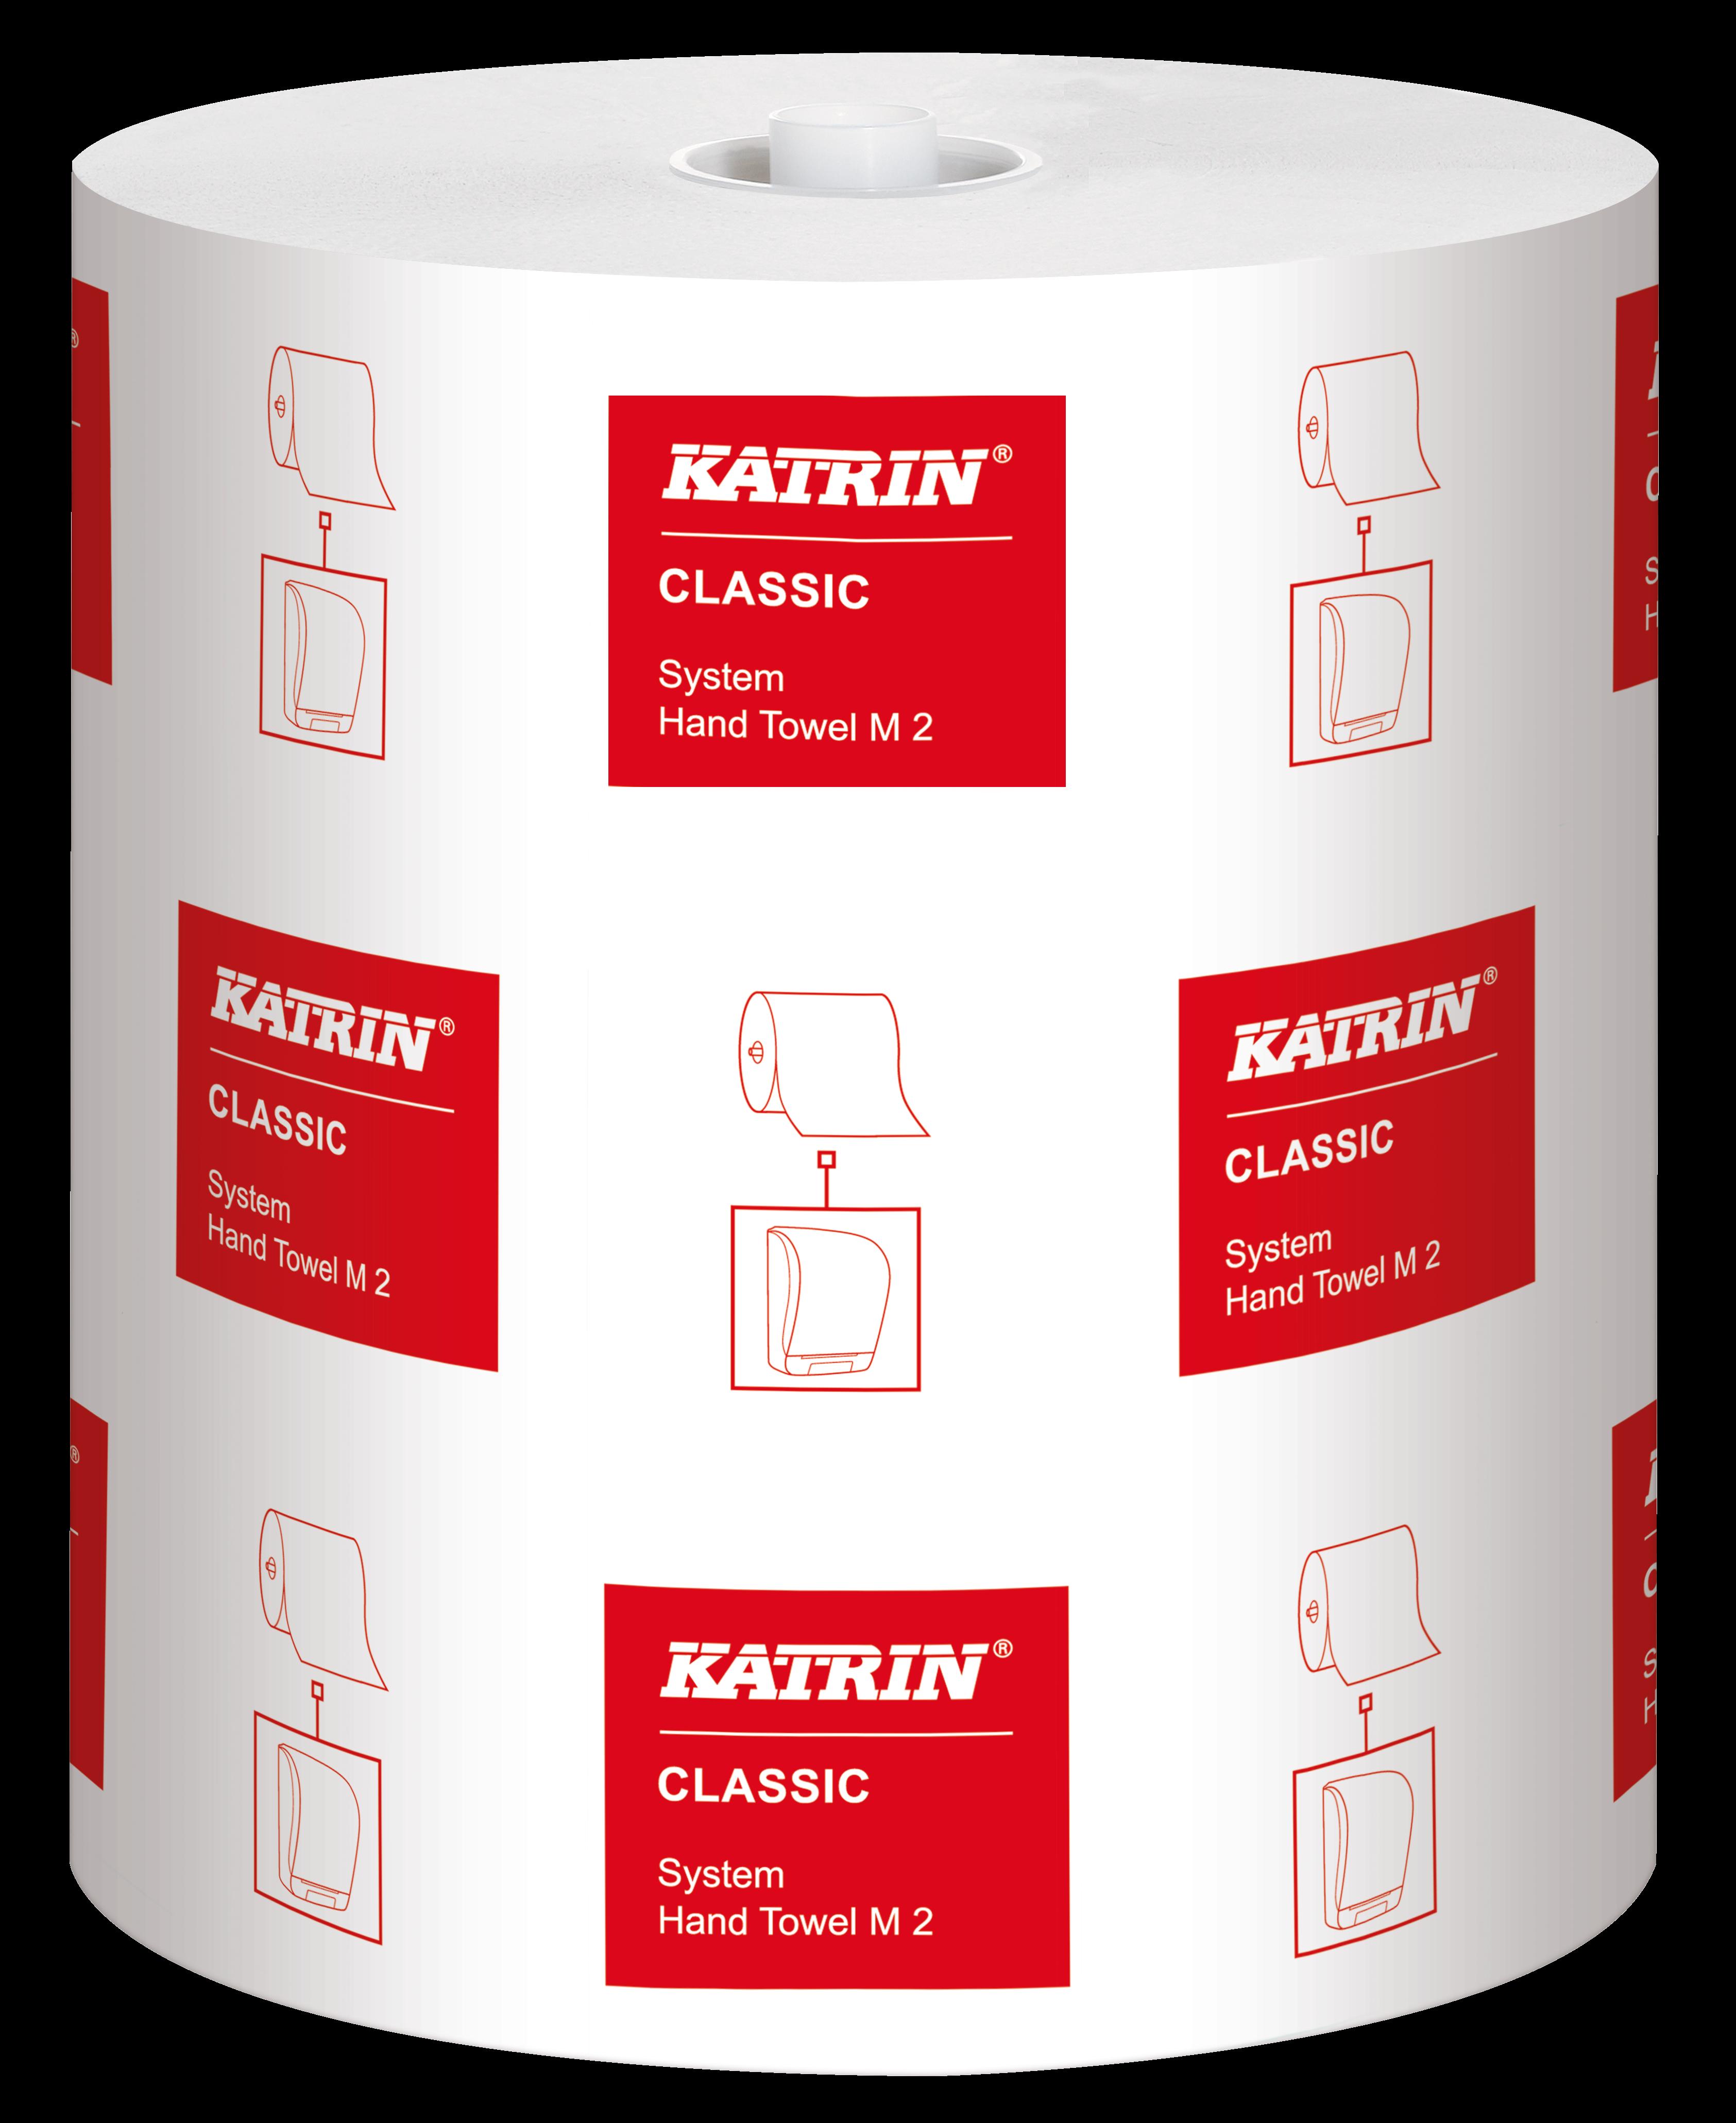 Katrin Classic System Towel M2